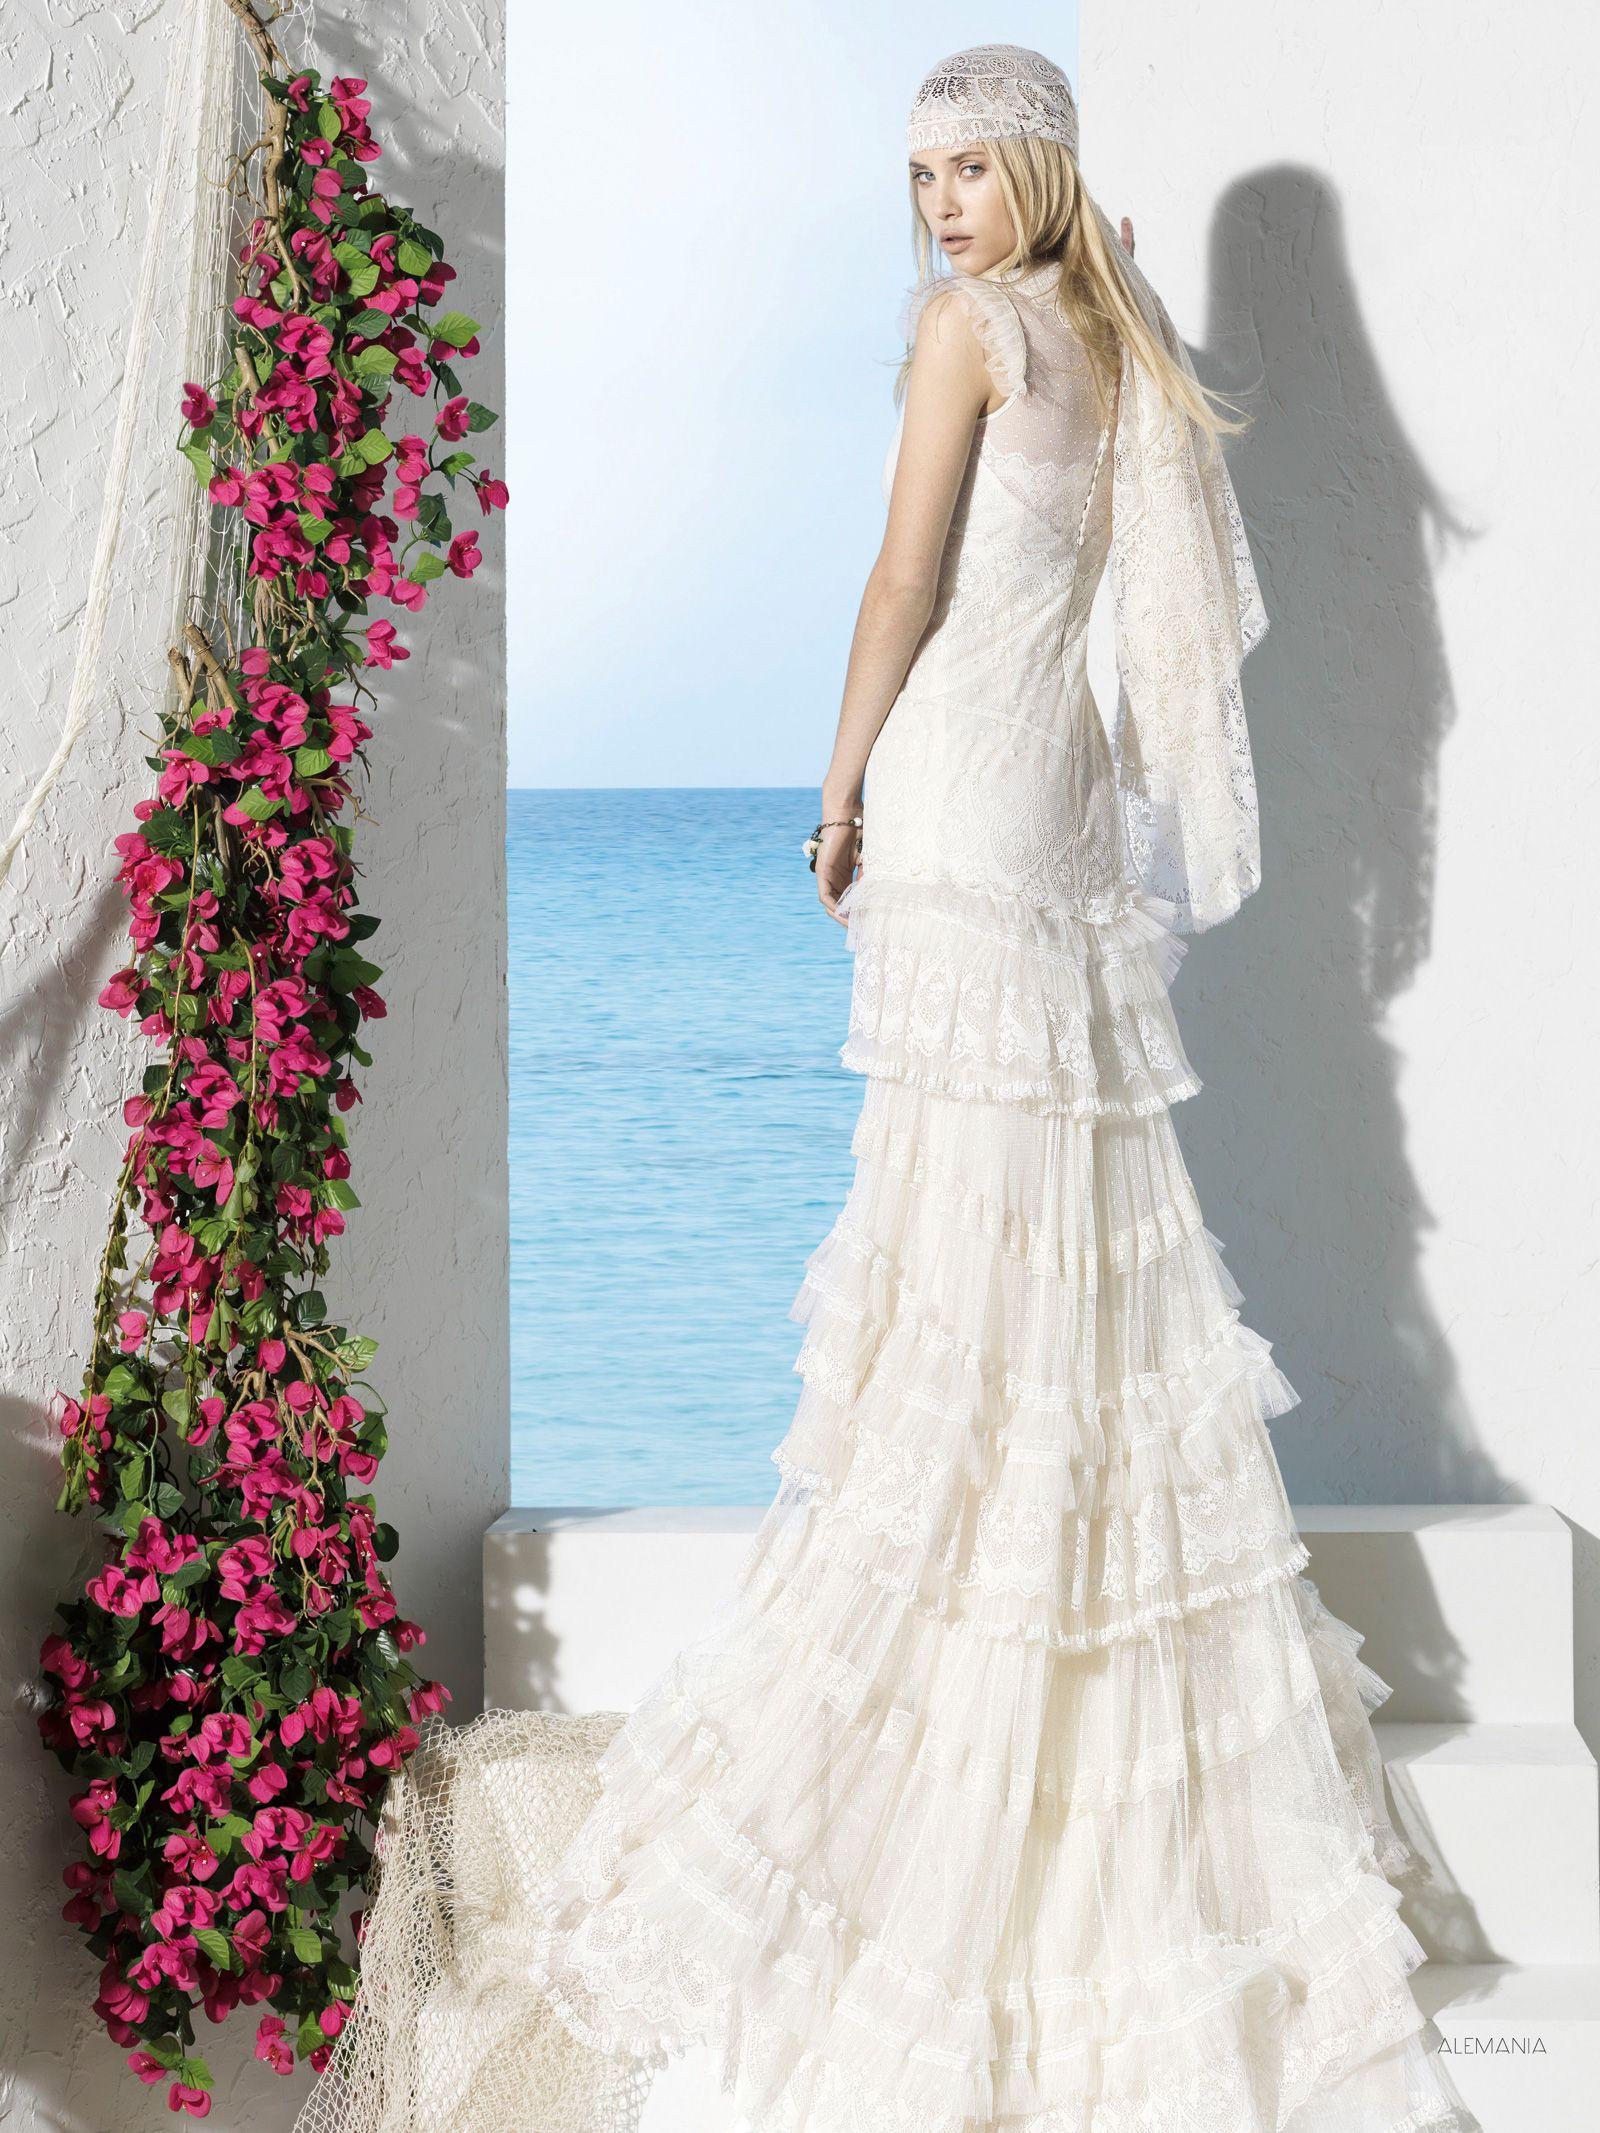 YolanCris | Vestidos de novia ibicencos BOHO GIRL de YolanCris. Ibiza! Novias 2013